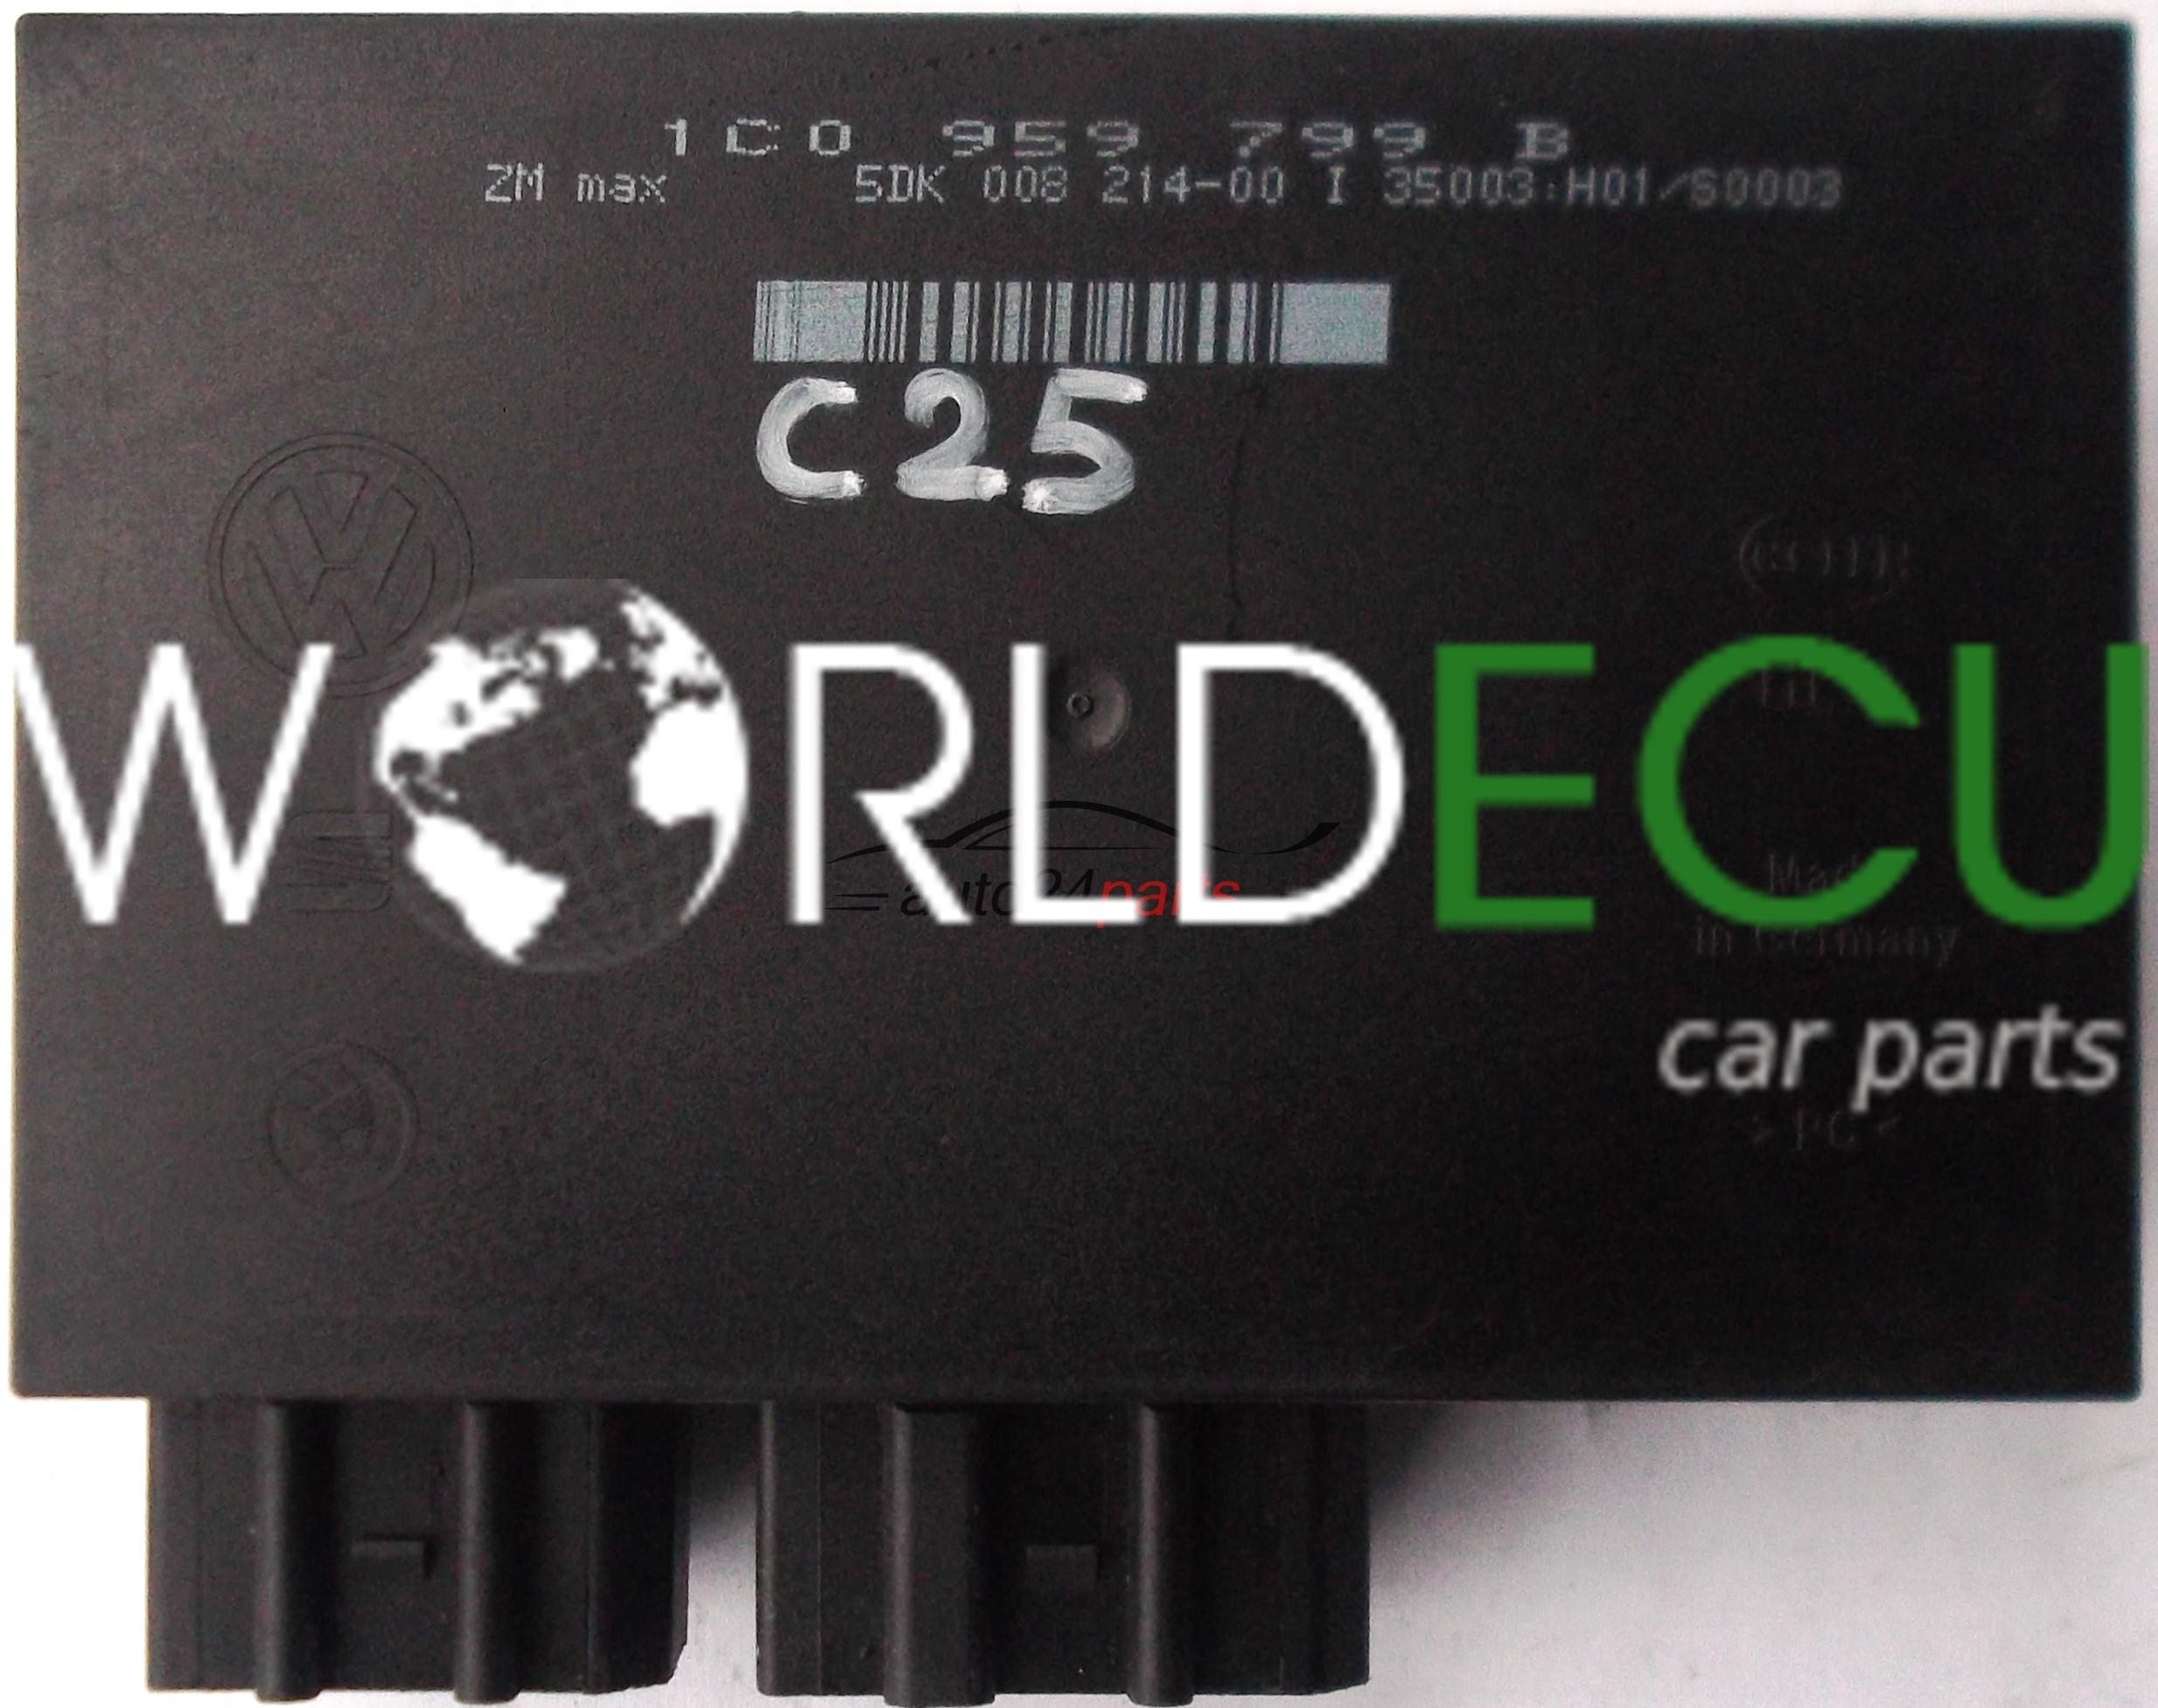 Comfort Control Module 1c0959799b 1c0 959 799 B Hella 5dk008214 00